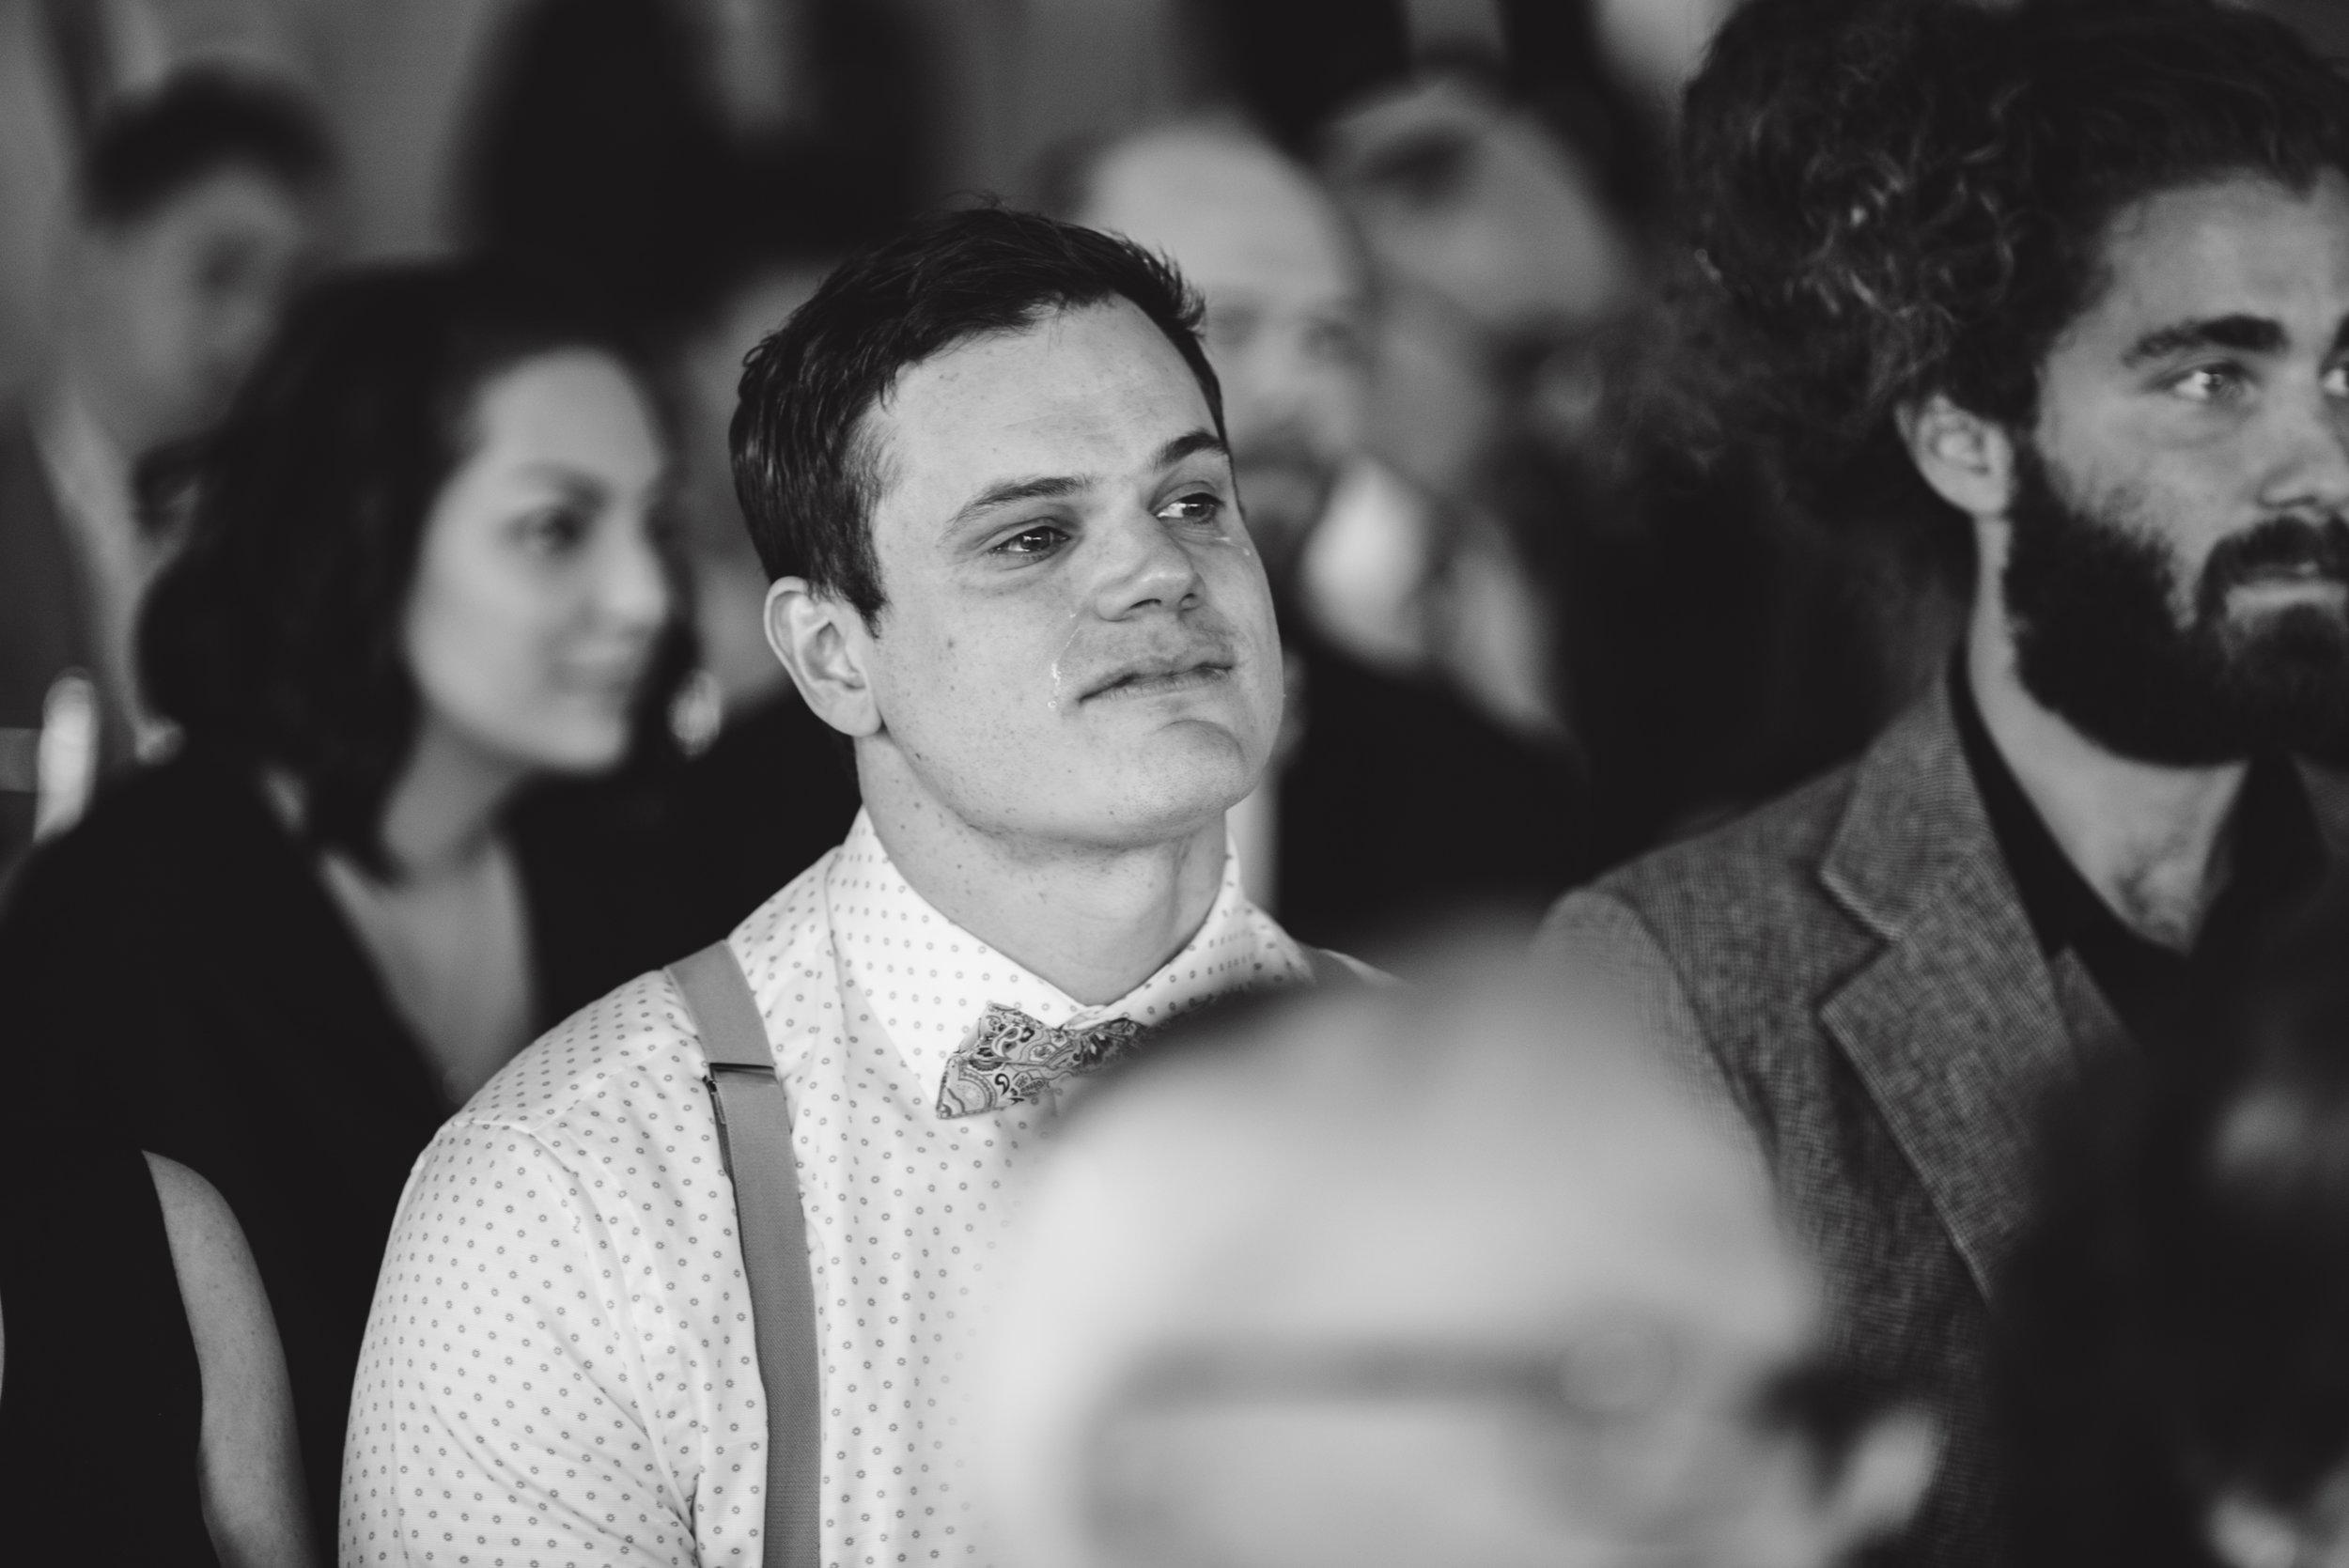 LIZA & JON - BATTERY PARK WEDDING - NYC INTIMATE WEDDING PHOTOGRAPHER - CHI-CHI AGBIM-411.jpg